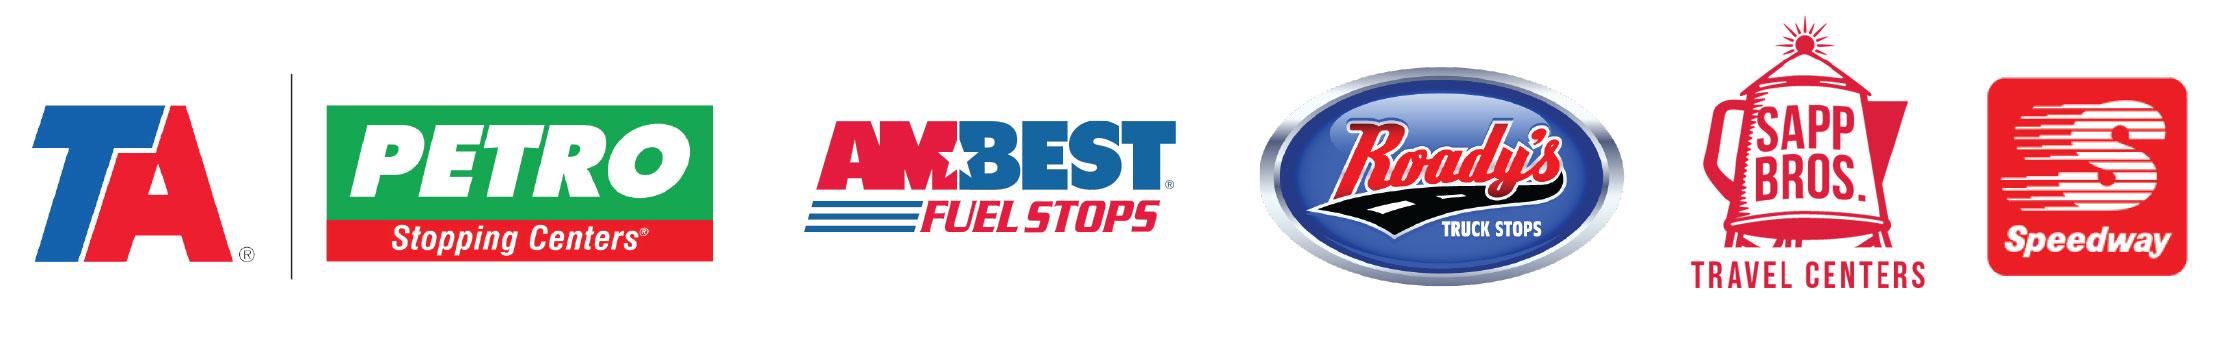 apex fuel partners offer fuel discounts - Speedway Fleet Card